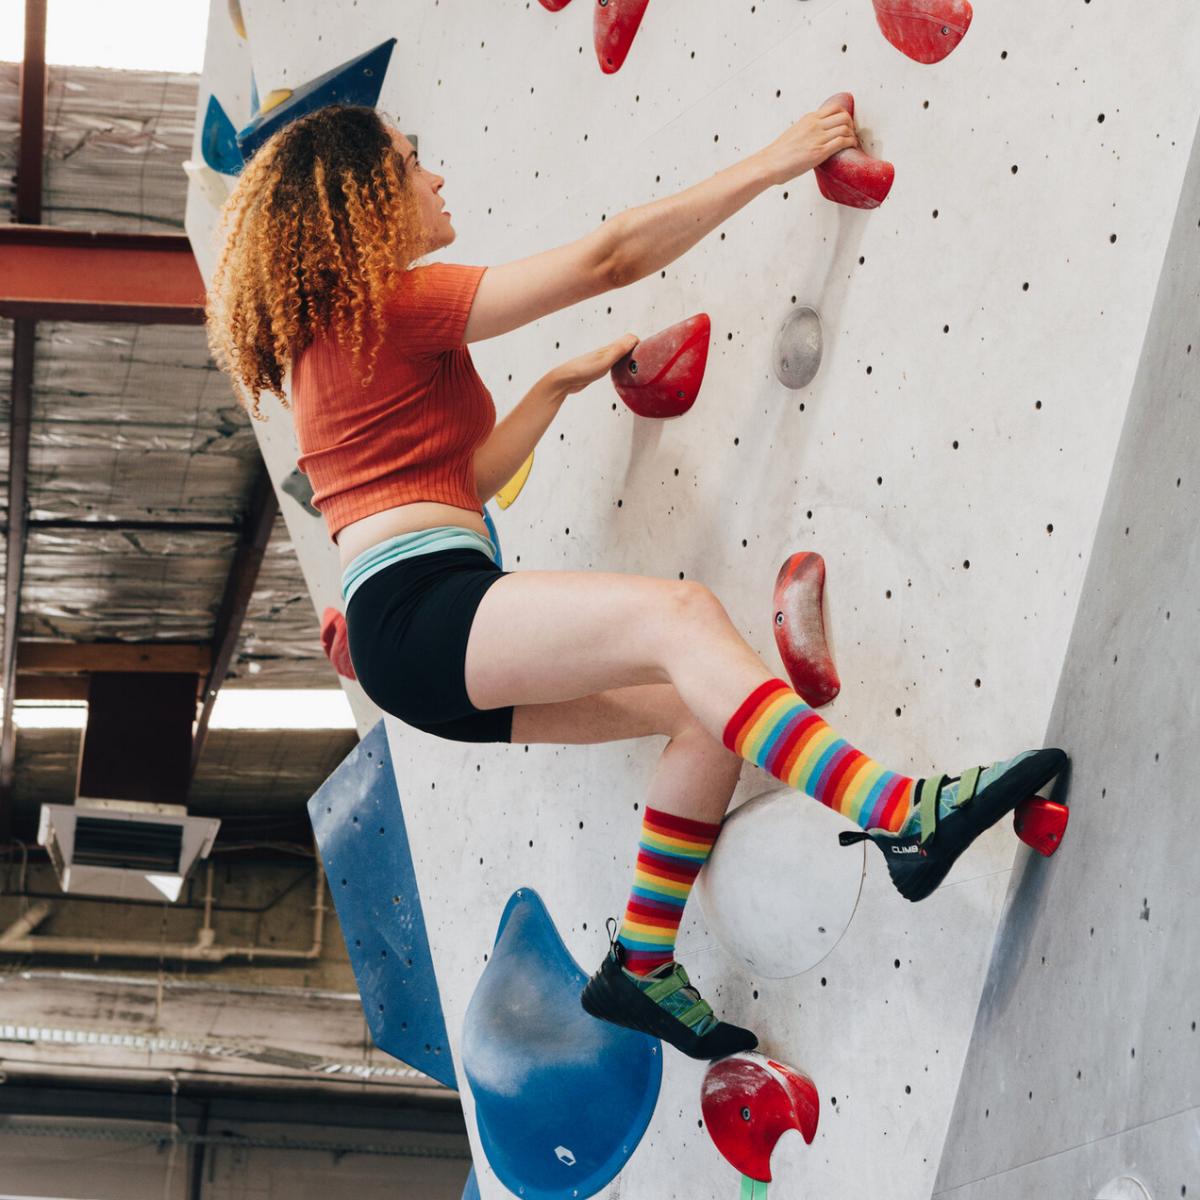 Person on rock climbing wall wearing rainbow socks